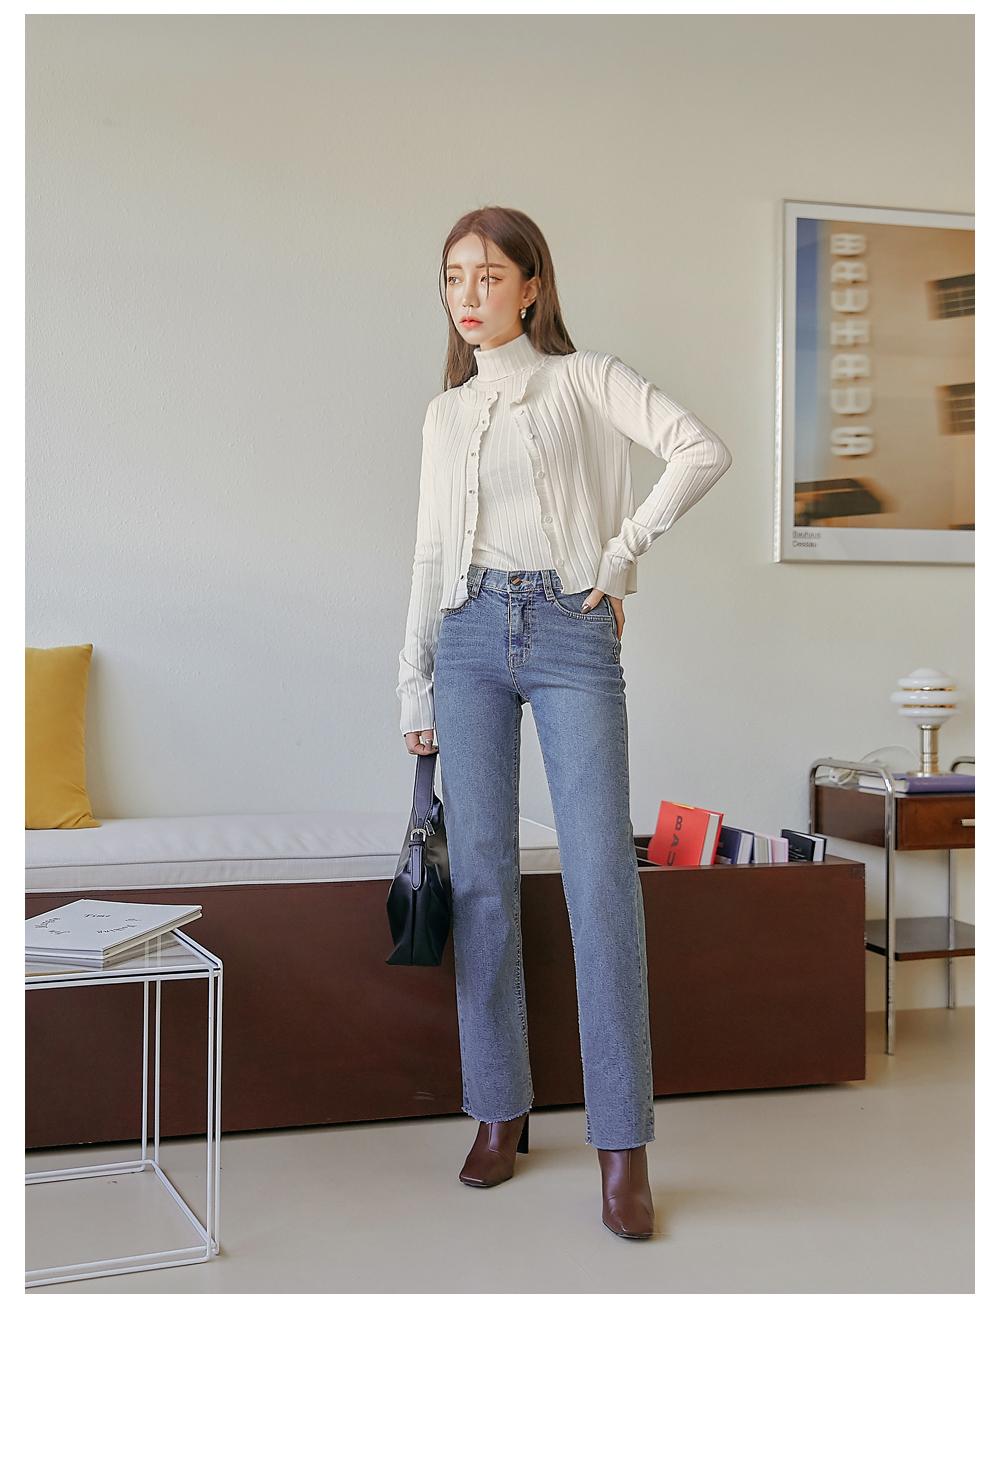 dress model image-S1L50